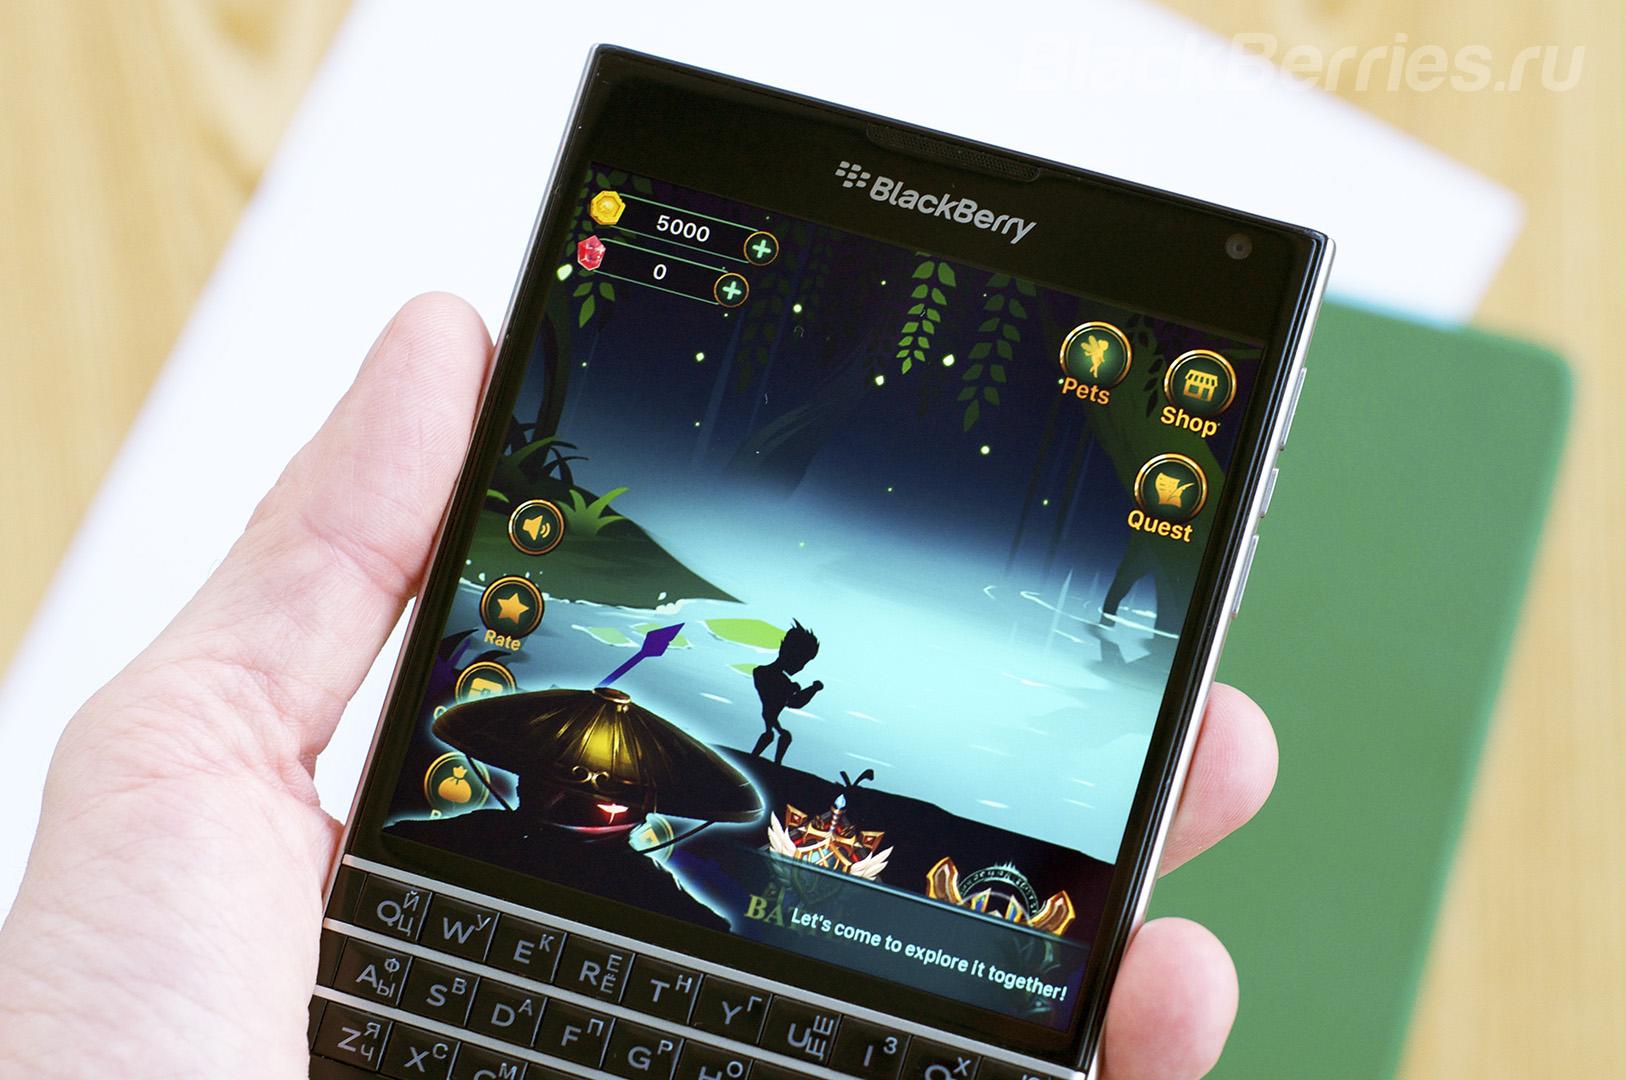 blackberry-dev-1